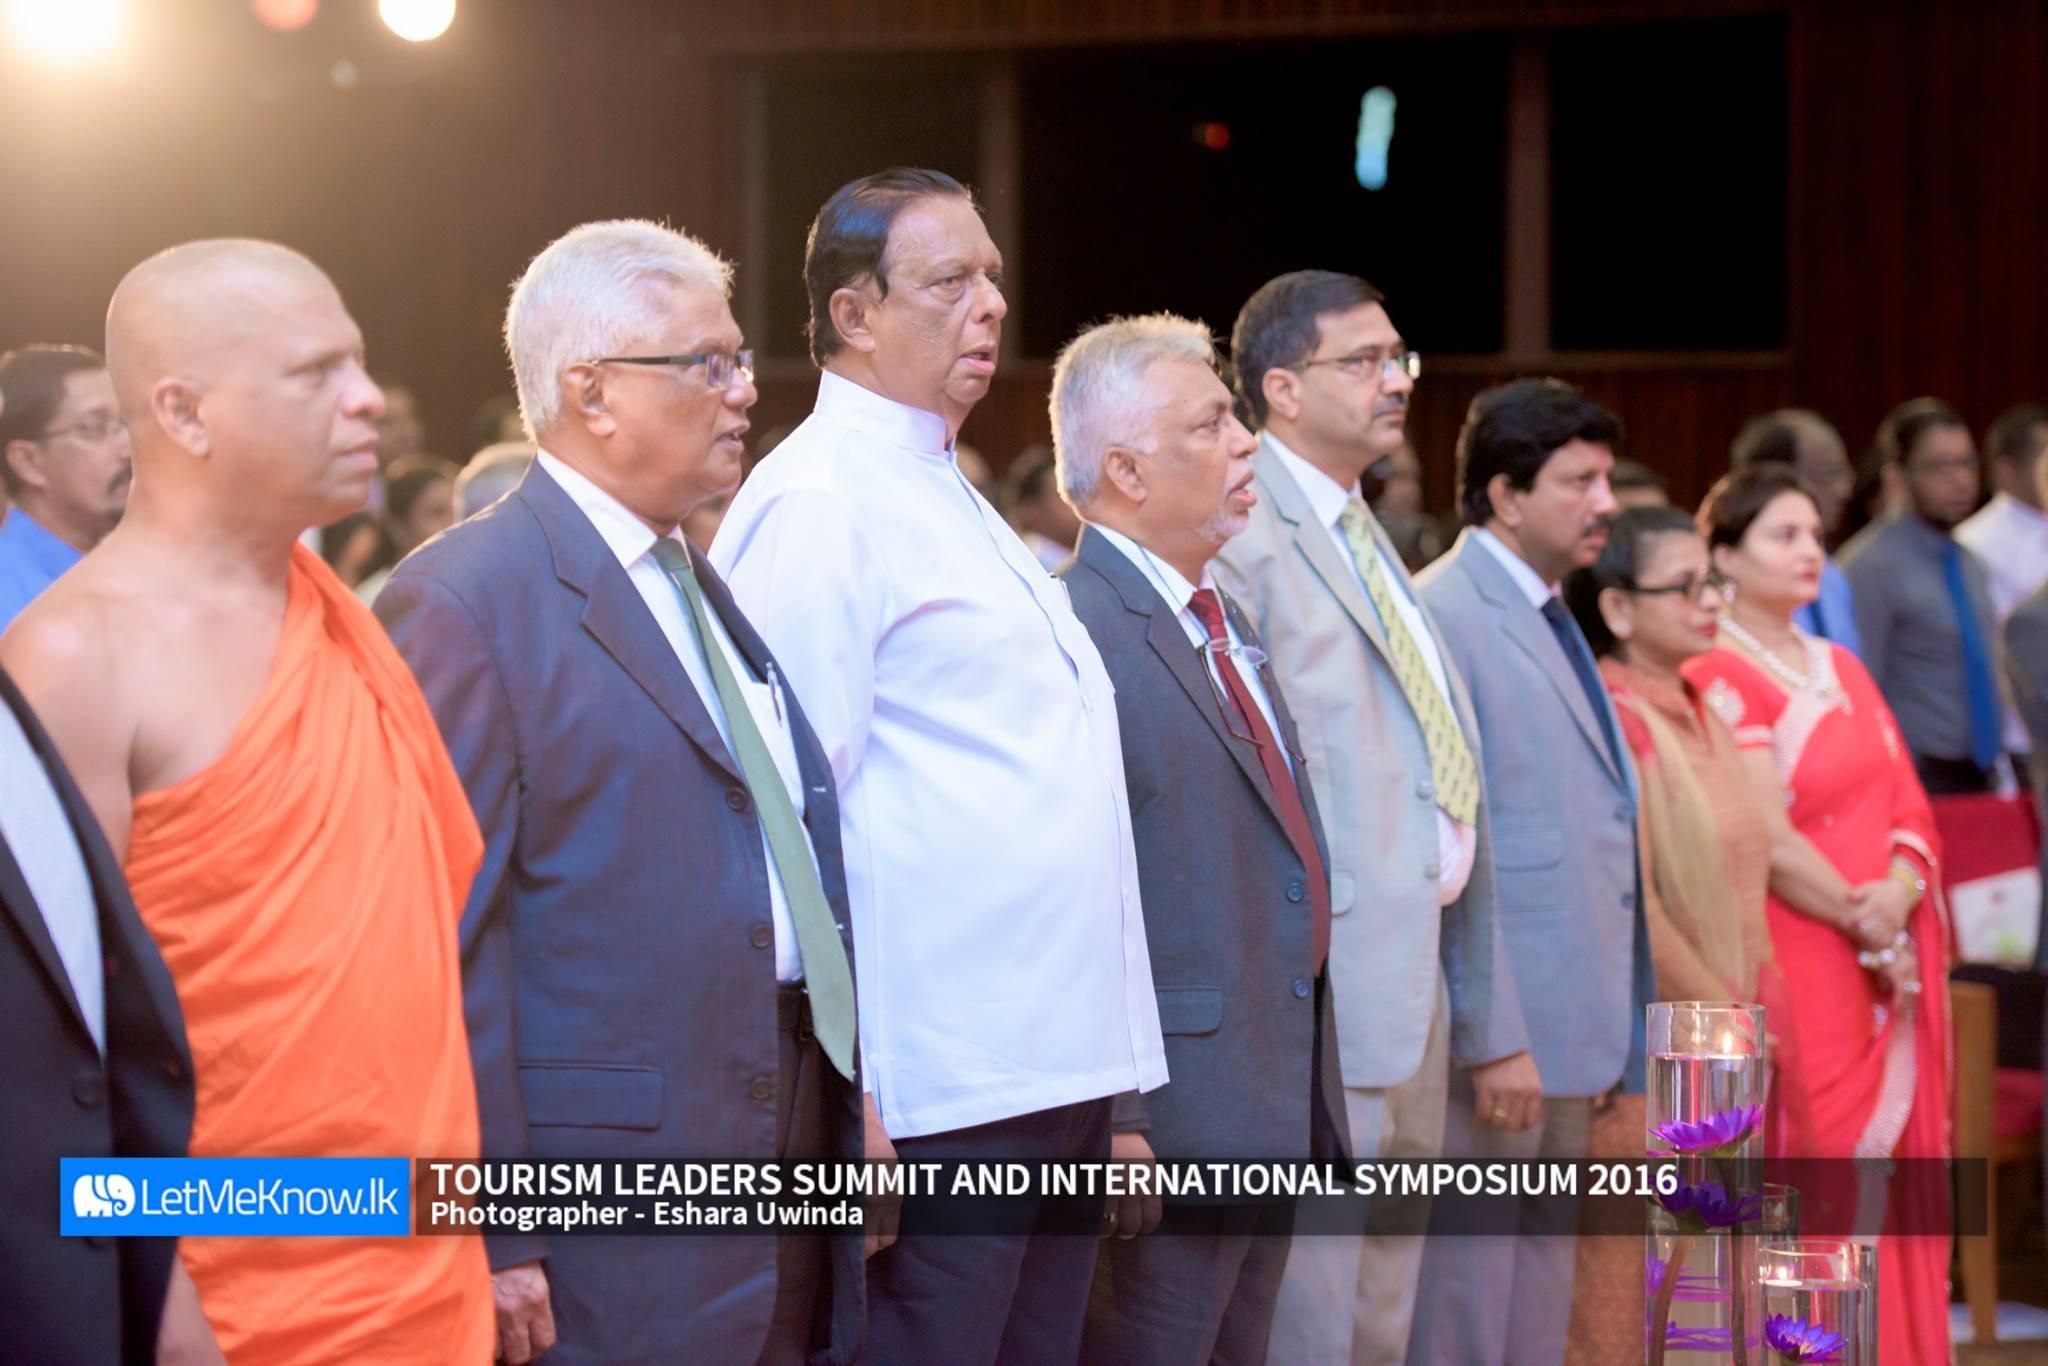 Tourism Leaders Summit and International Symposium 2016